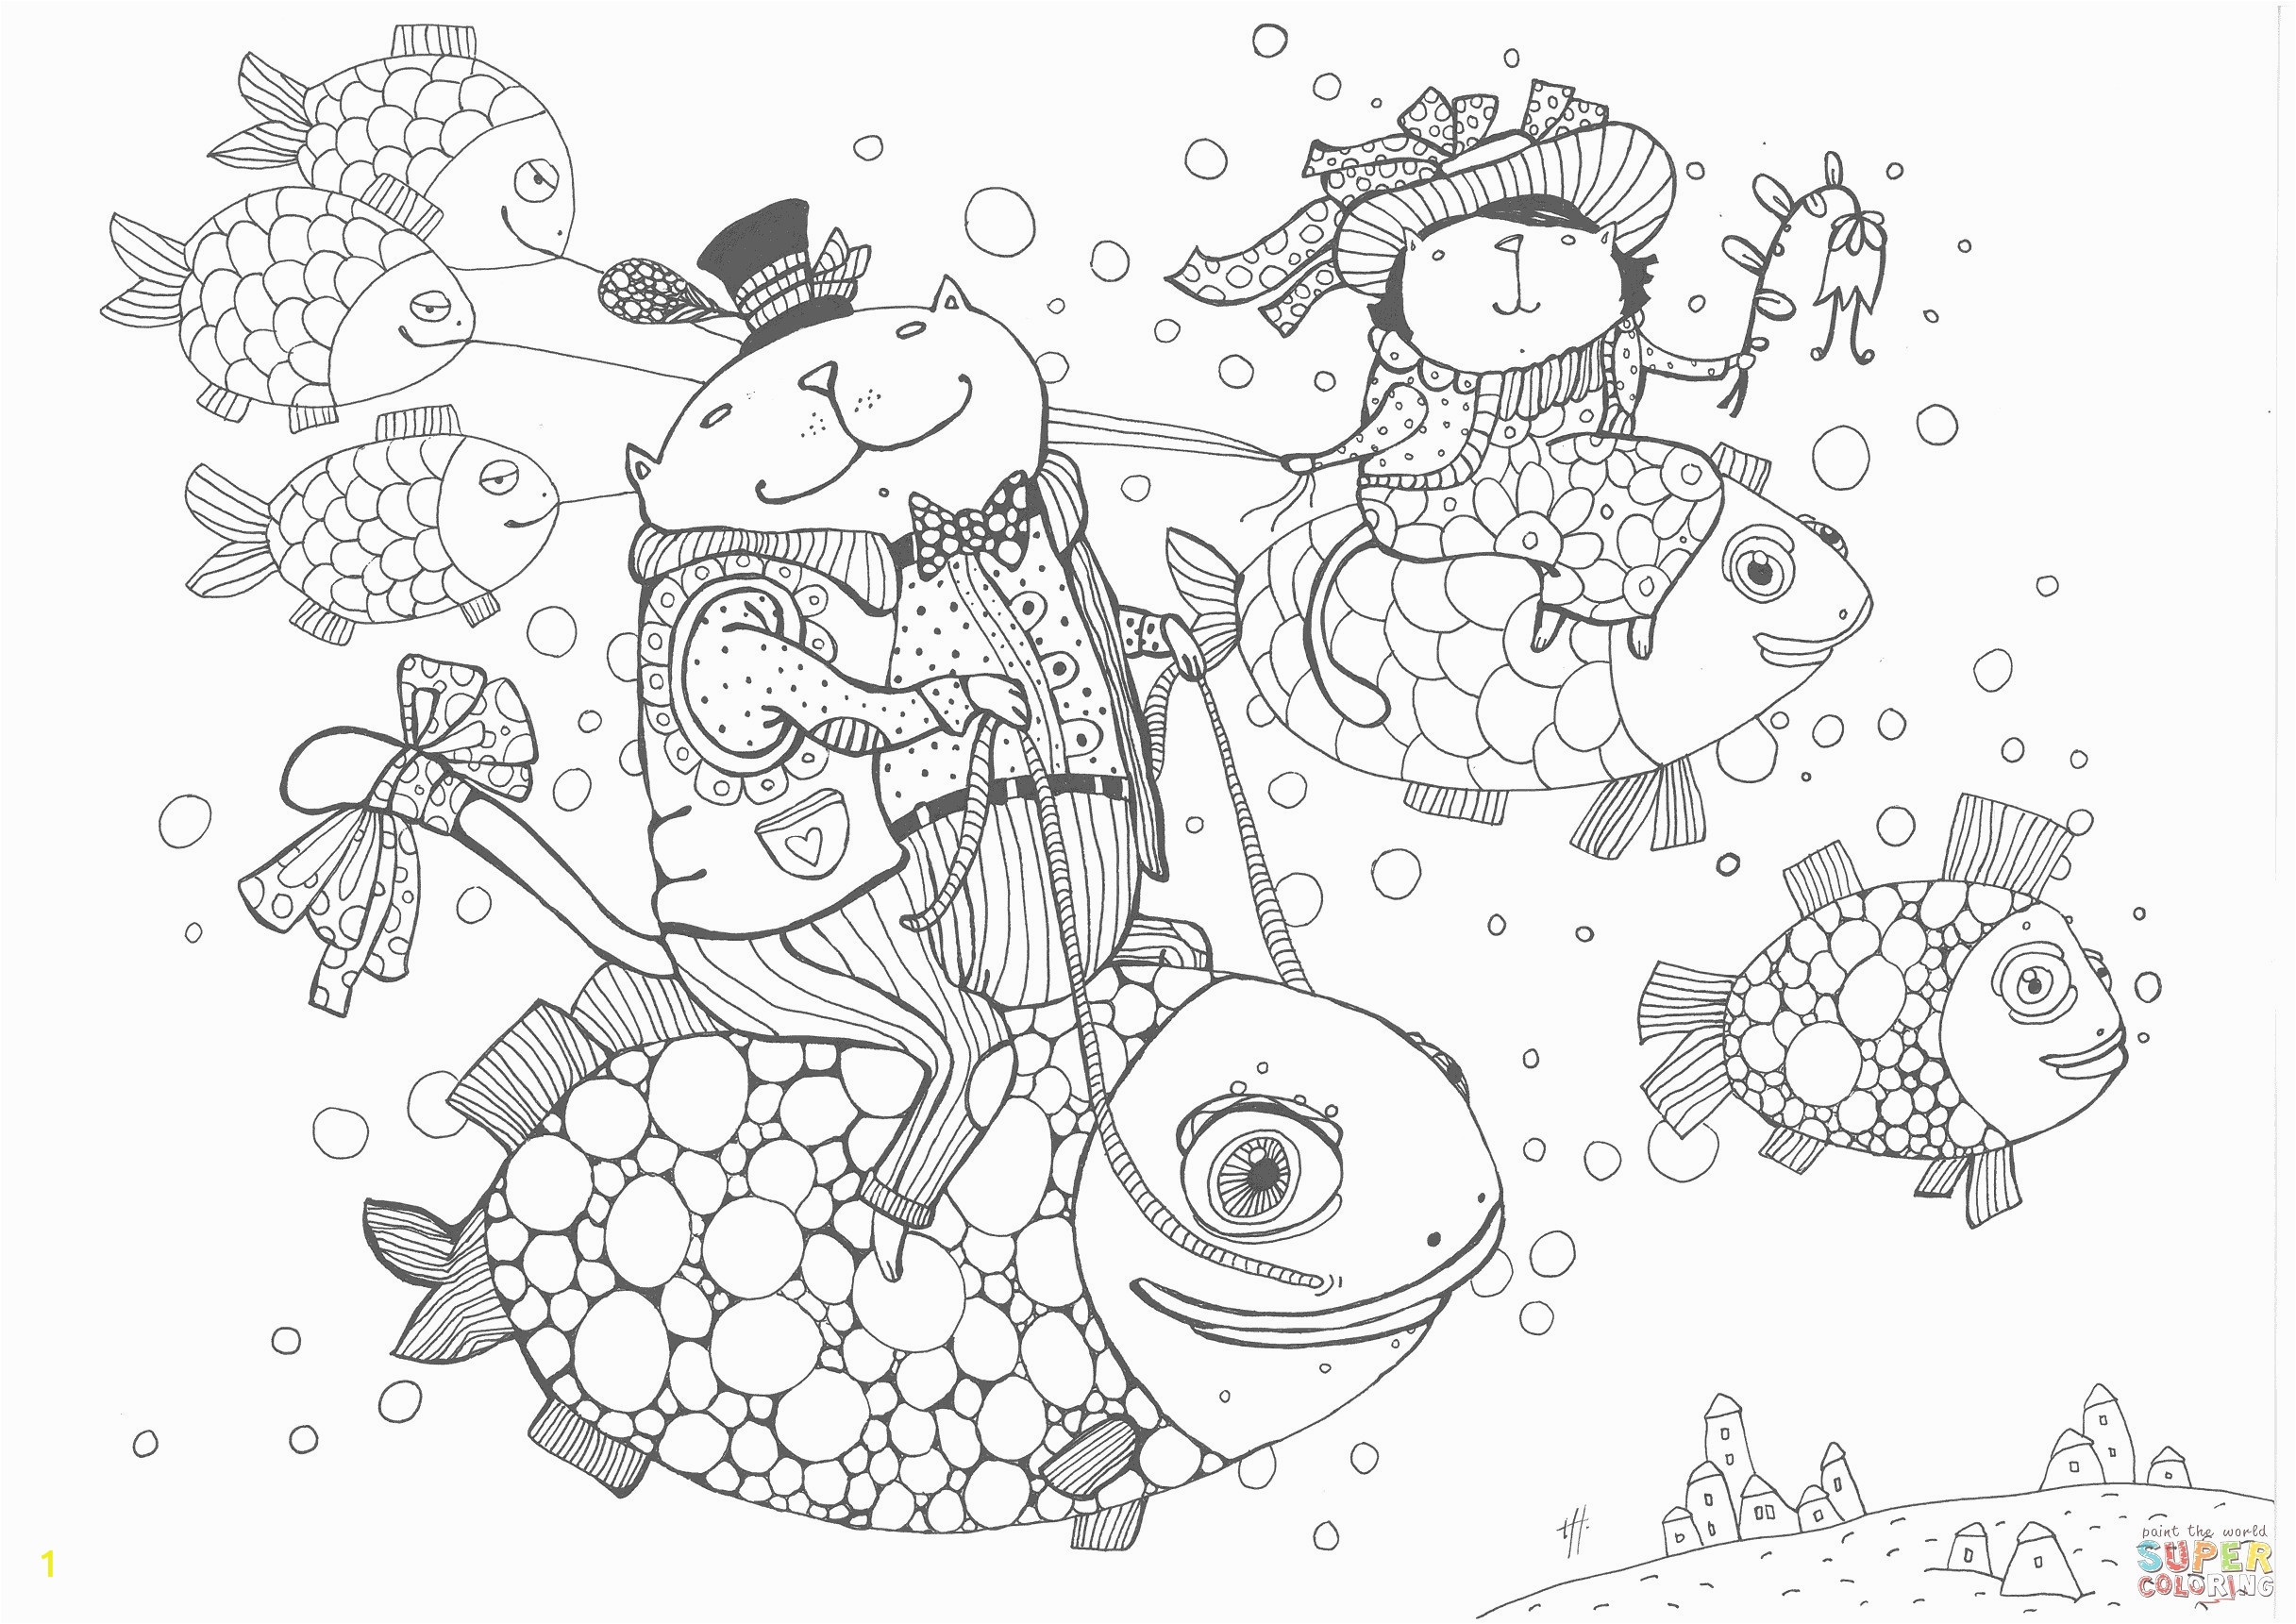 fancykeleton coloring pages printable for kidsplendi humanheets elegant ninjago skeleton splendi lego costume destiny s bounty robot zane temple of airjitzu ultra